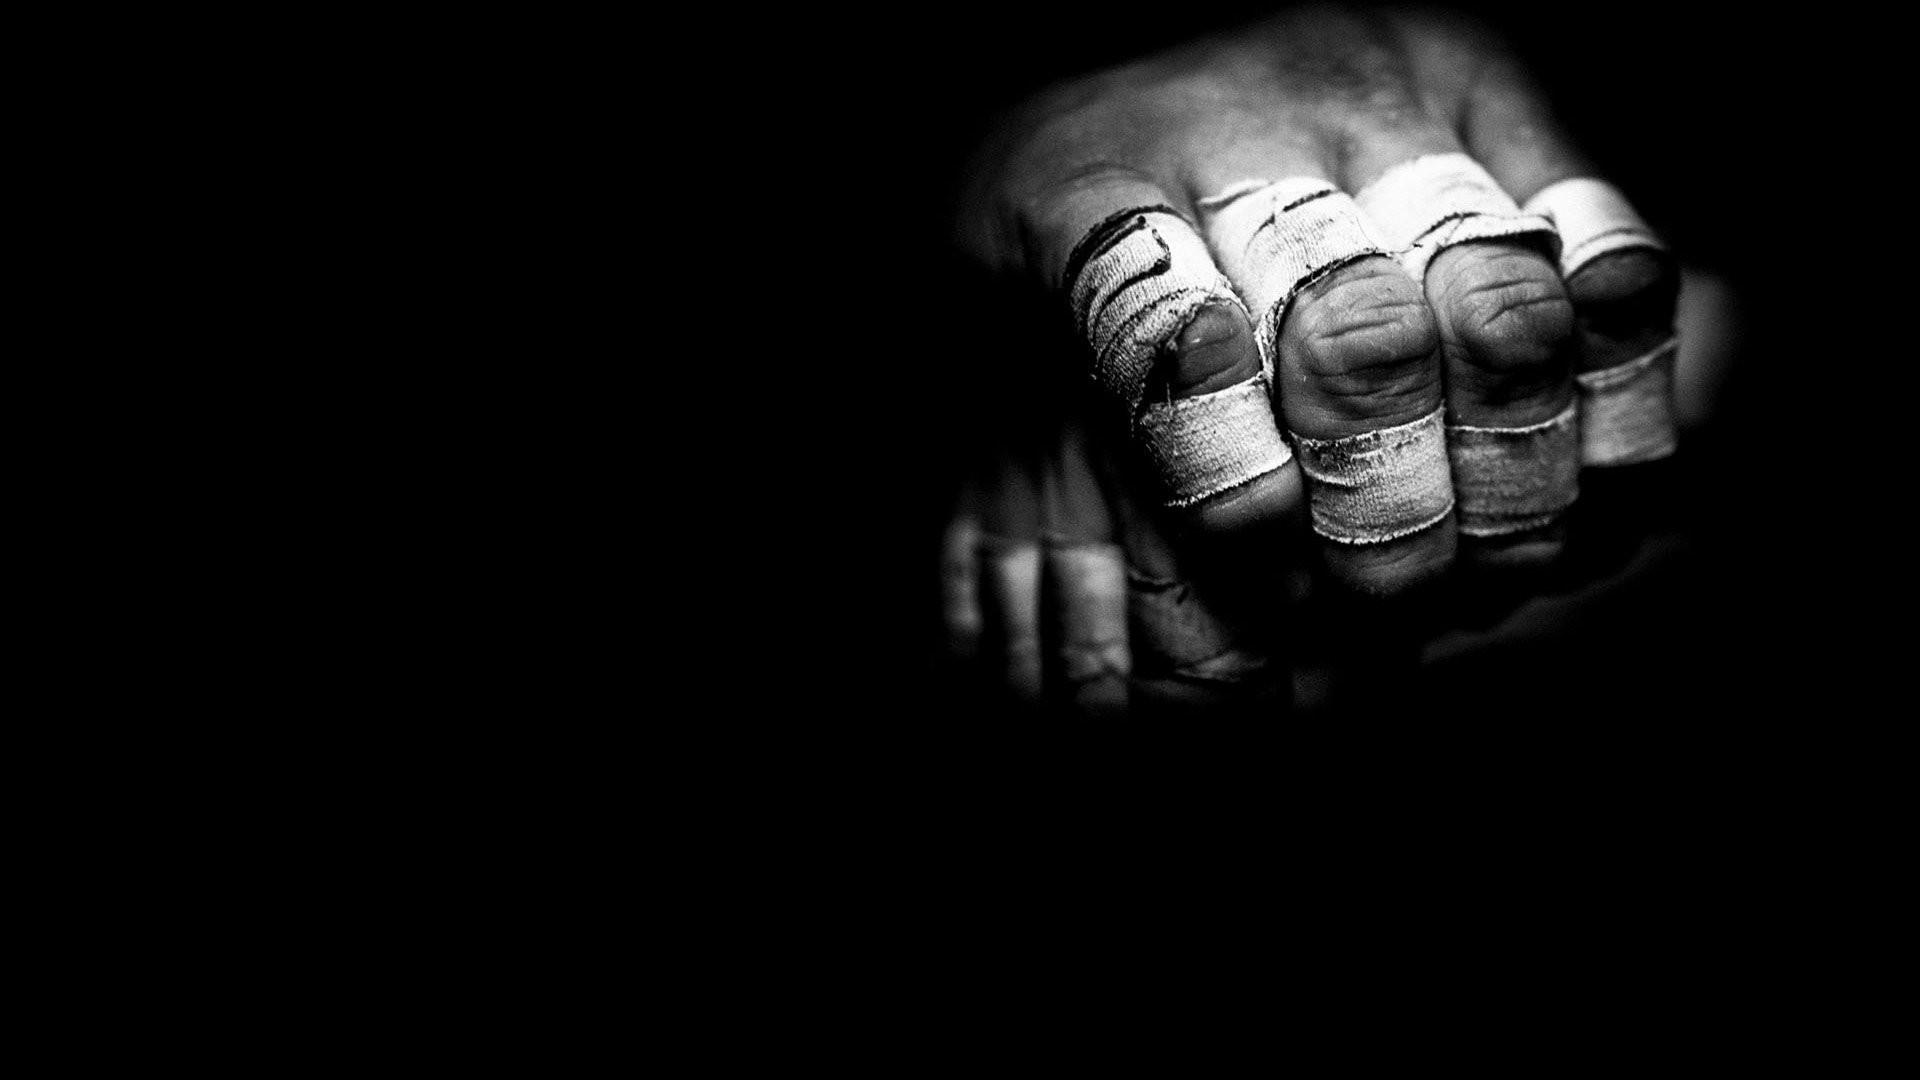 Manny Pacquiao Quotes Wallpaper Gracie Jiu Jitsu Wallpaper 78 Images